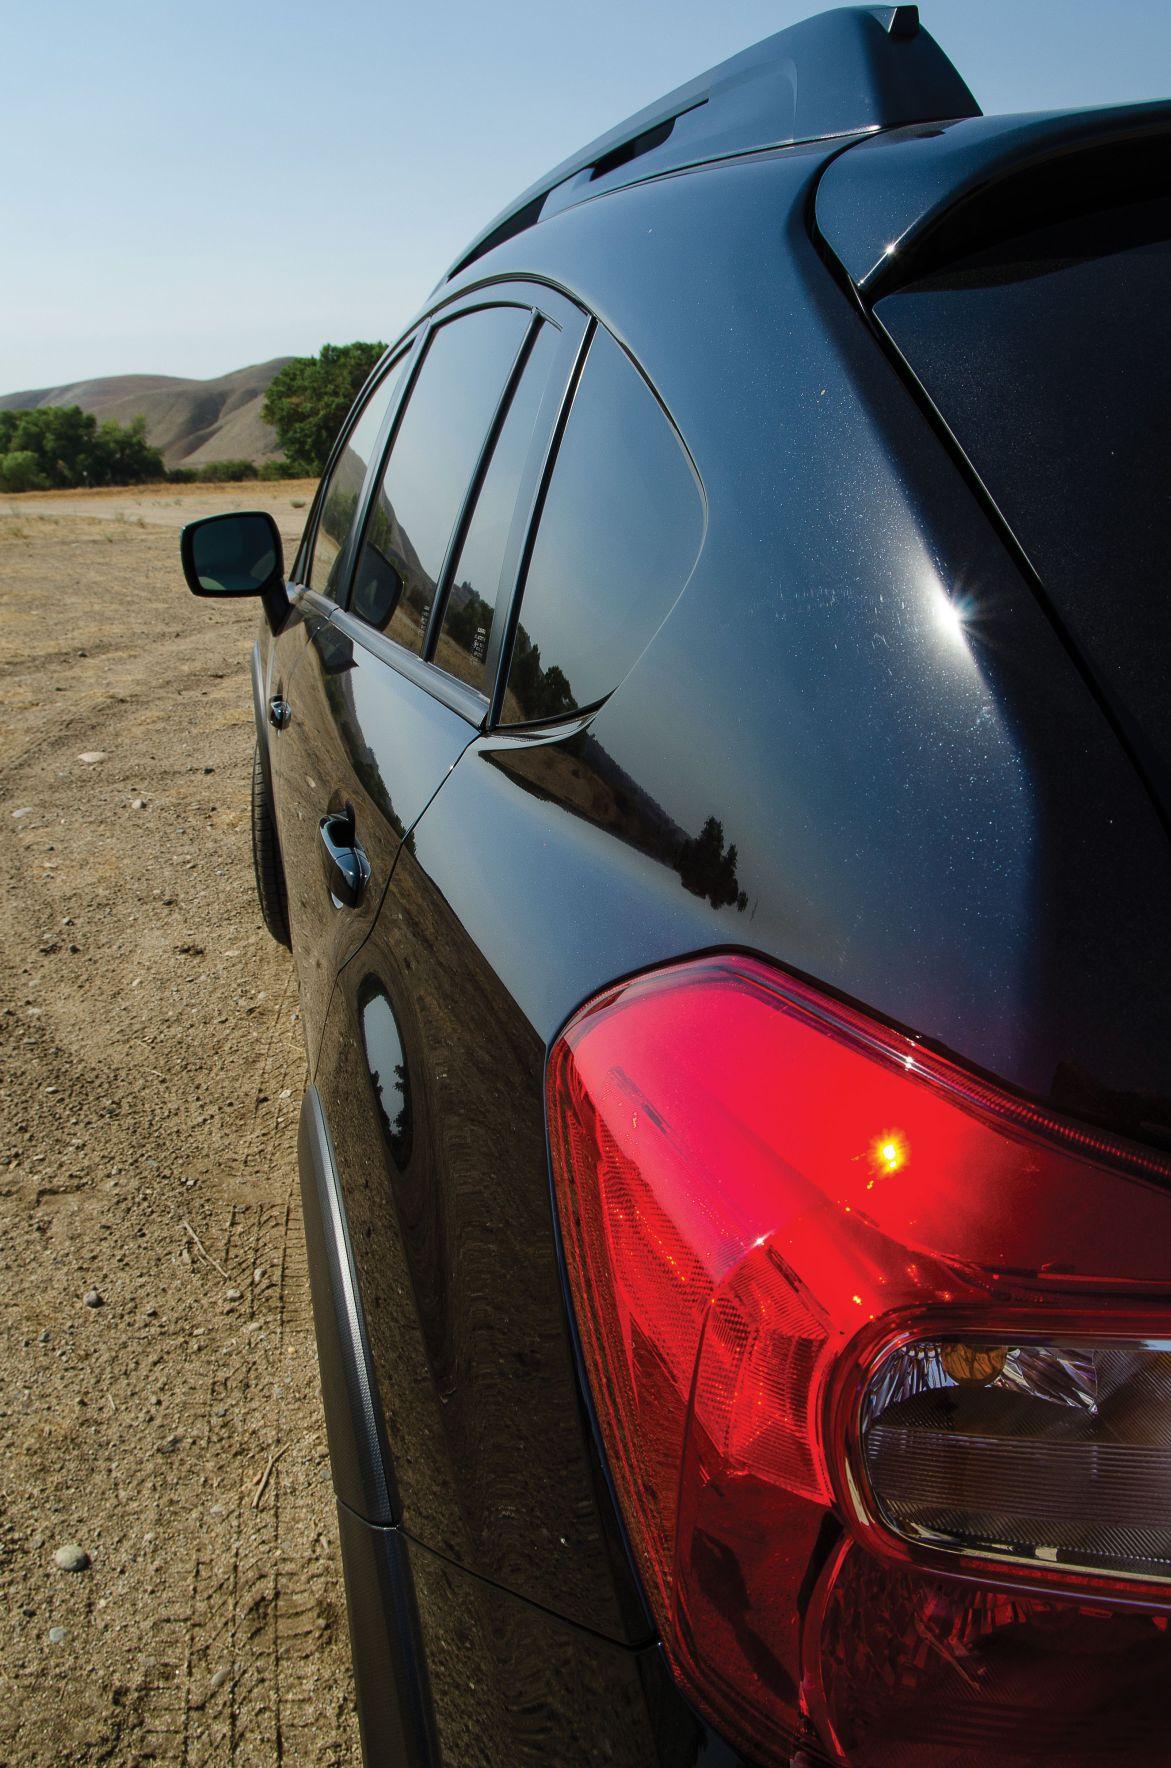 On the Road: Subaru XV Crosstrek | Bakersfield Life